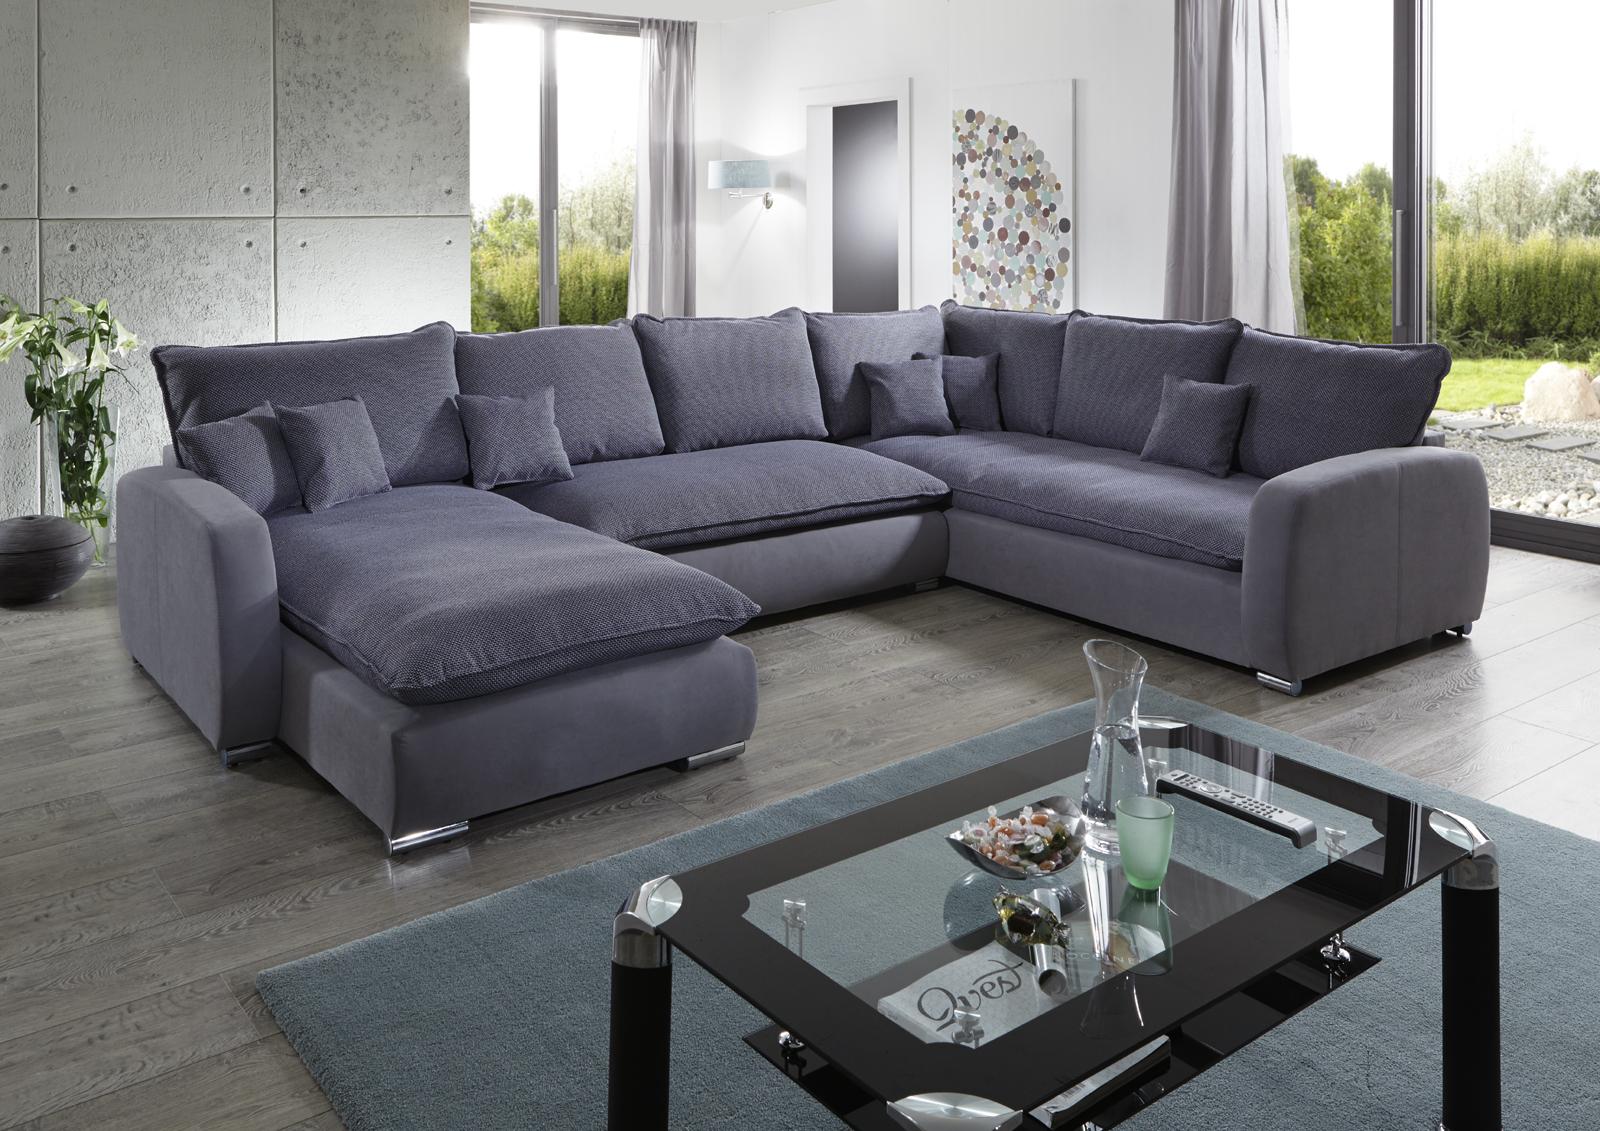 Sam sofa grau wohnlandschaft scala 180 x 350 x 230 cm for Sofa 0 finanzierung